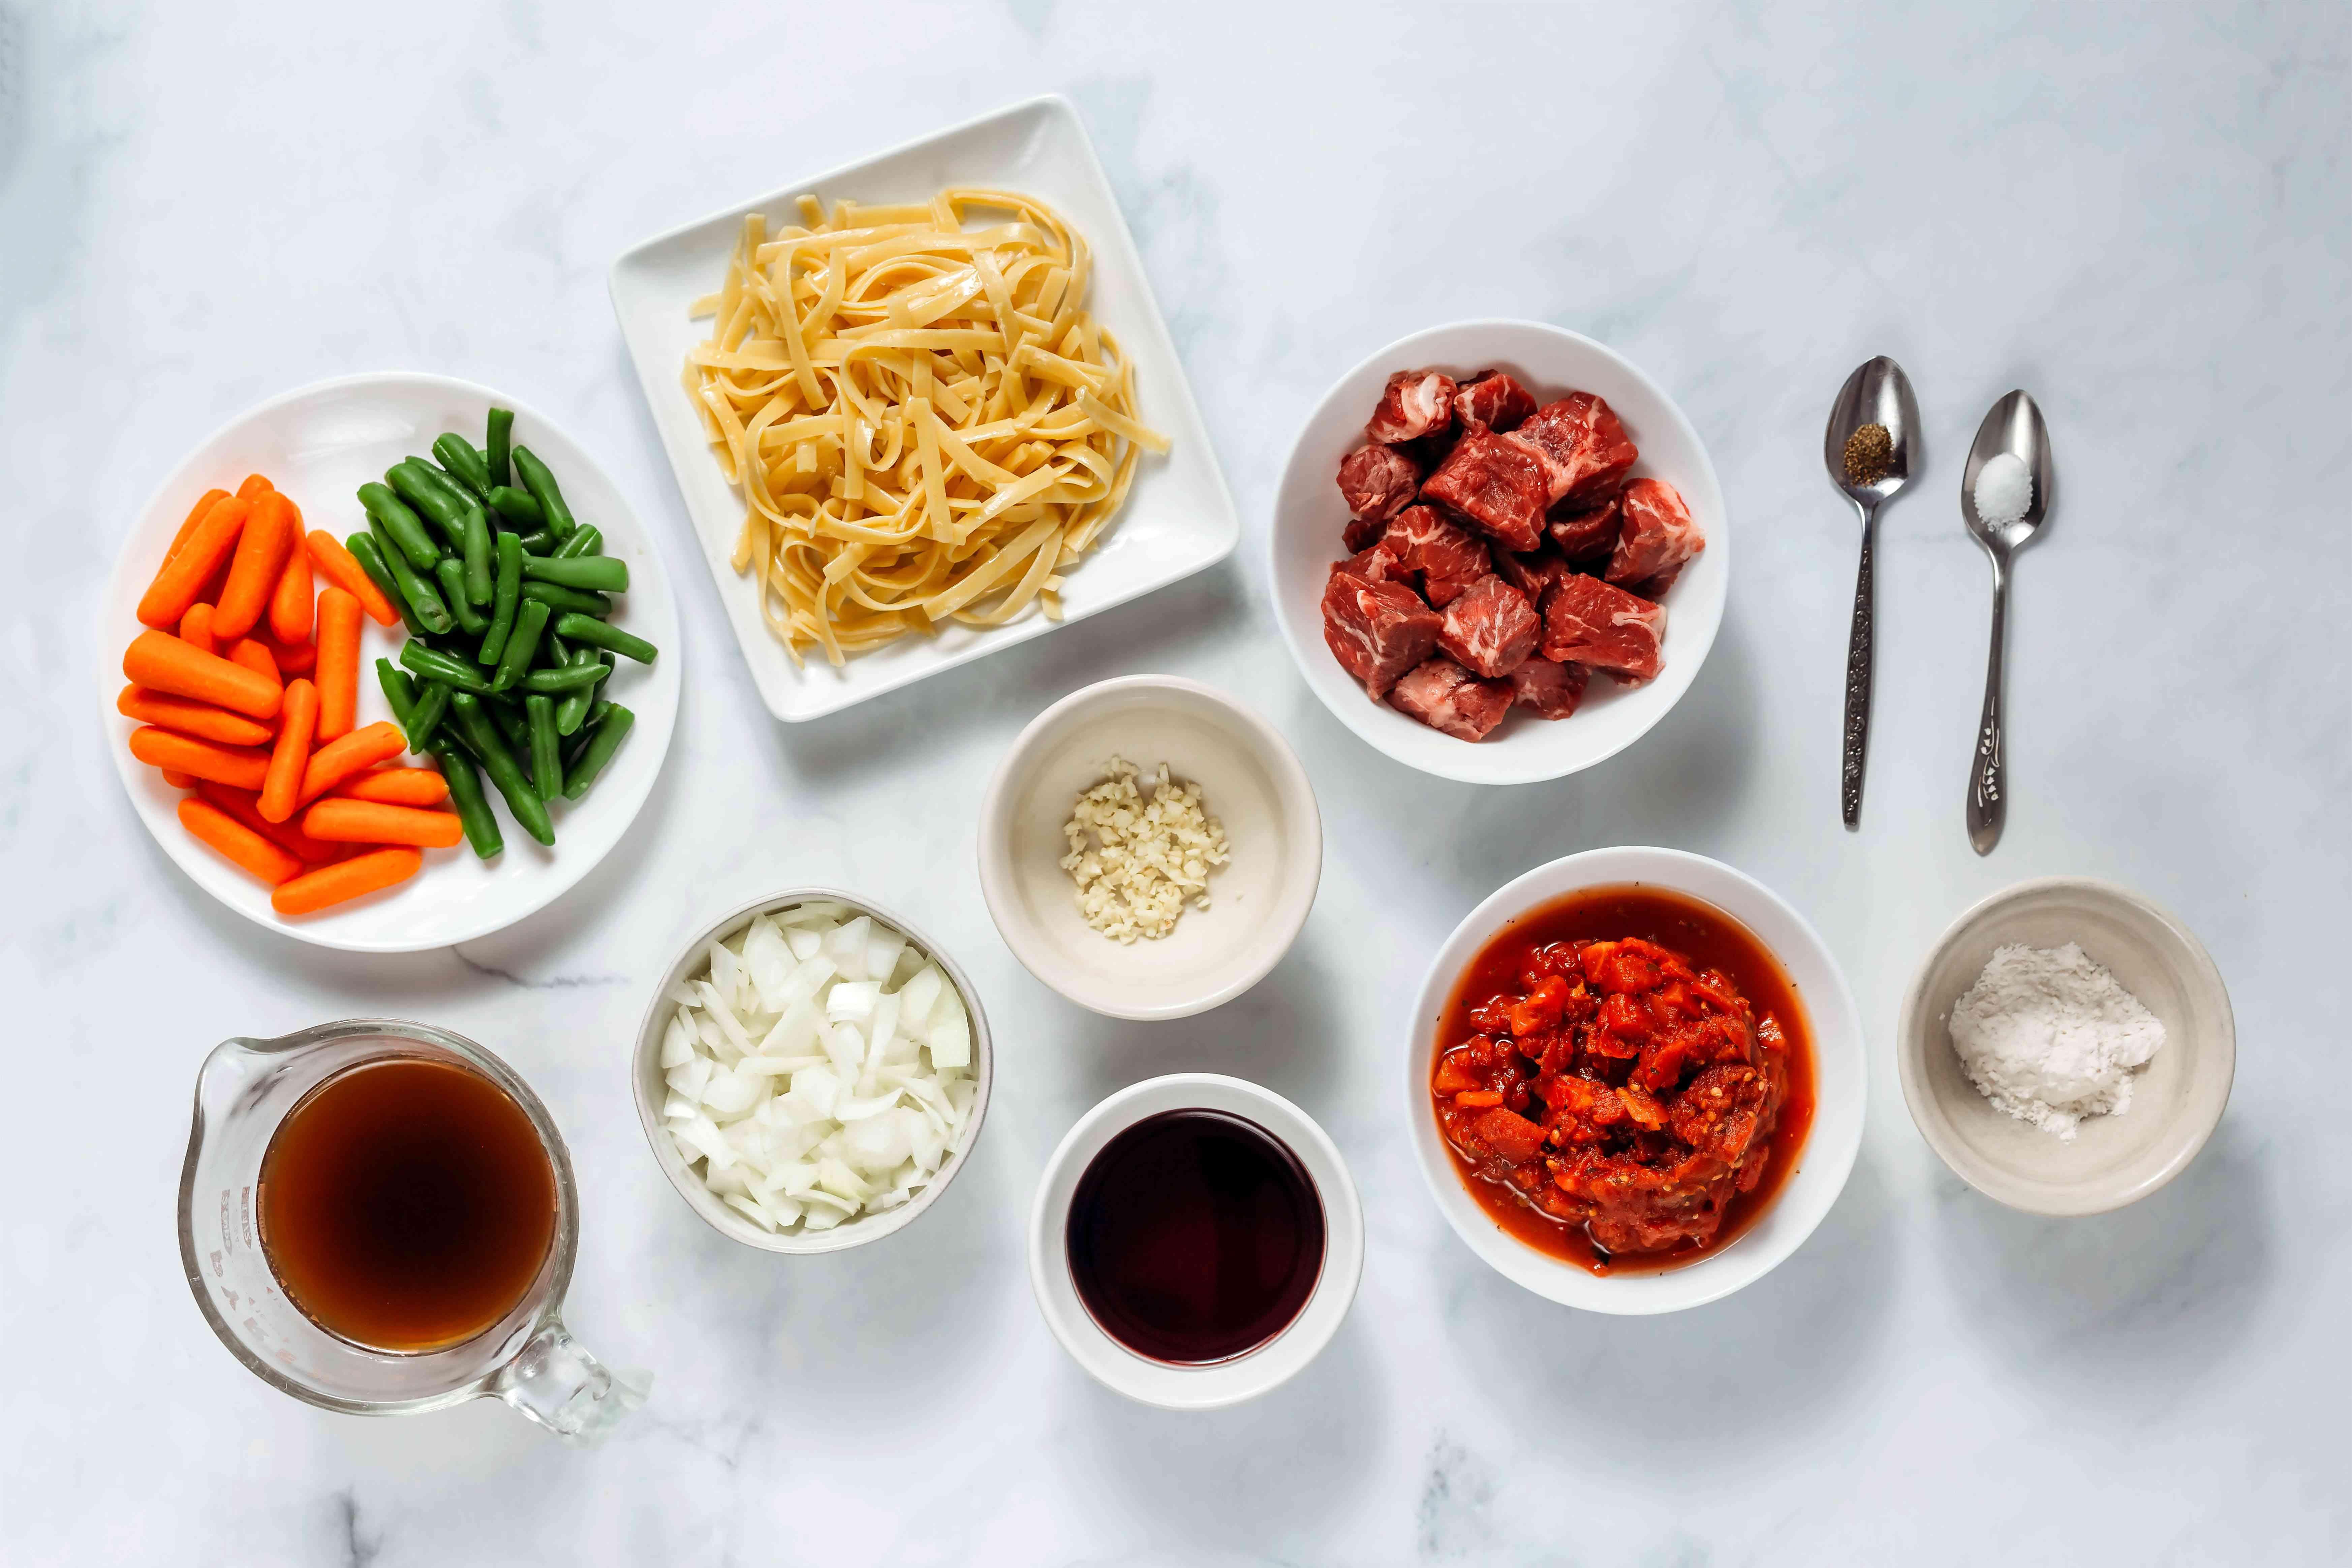 Healthy Crockpot Beef Stew ingredients